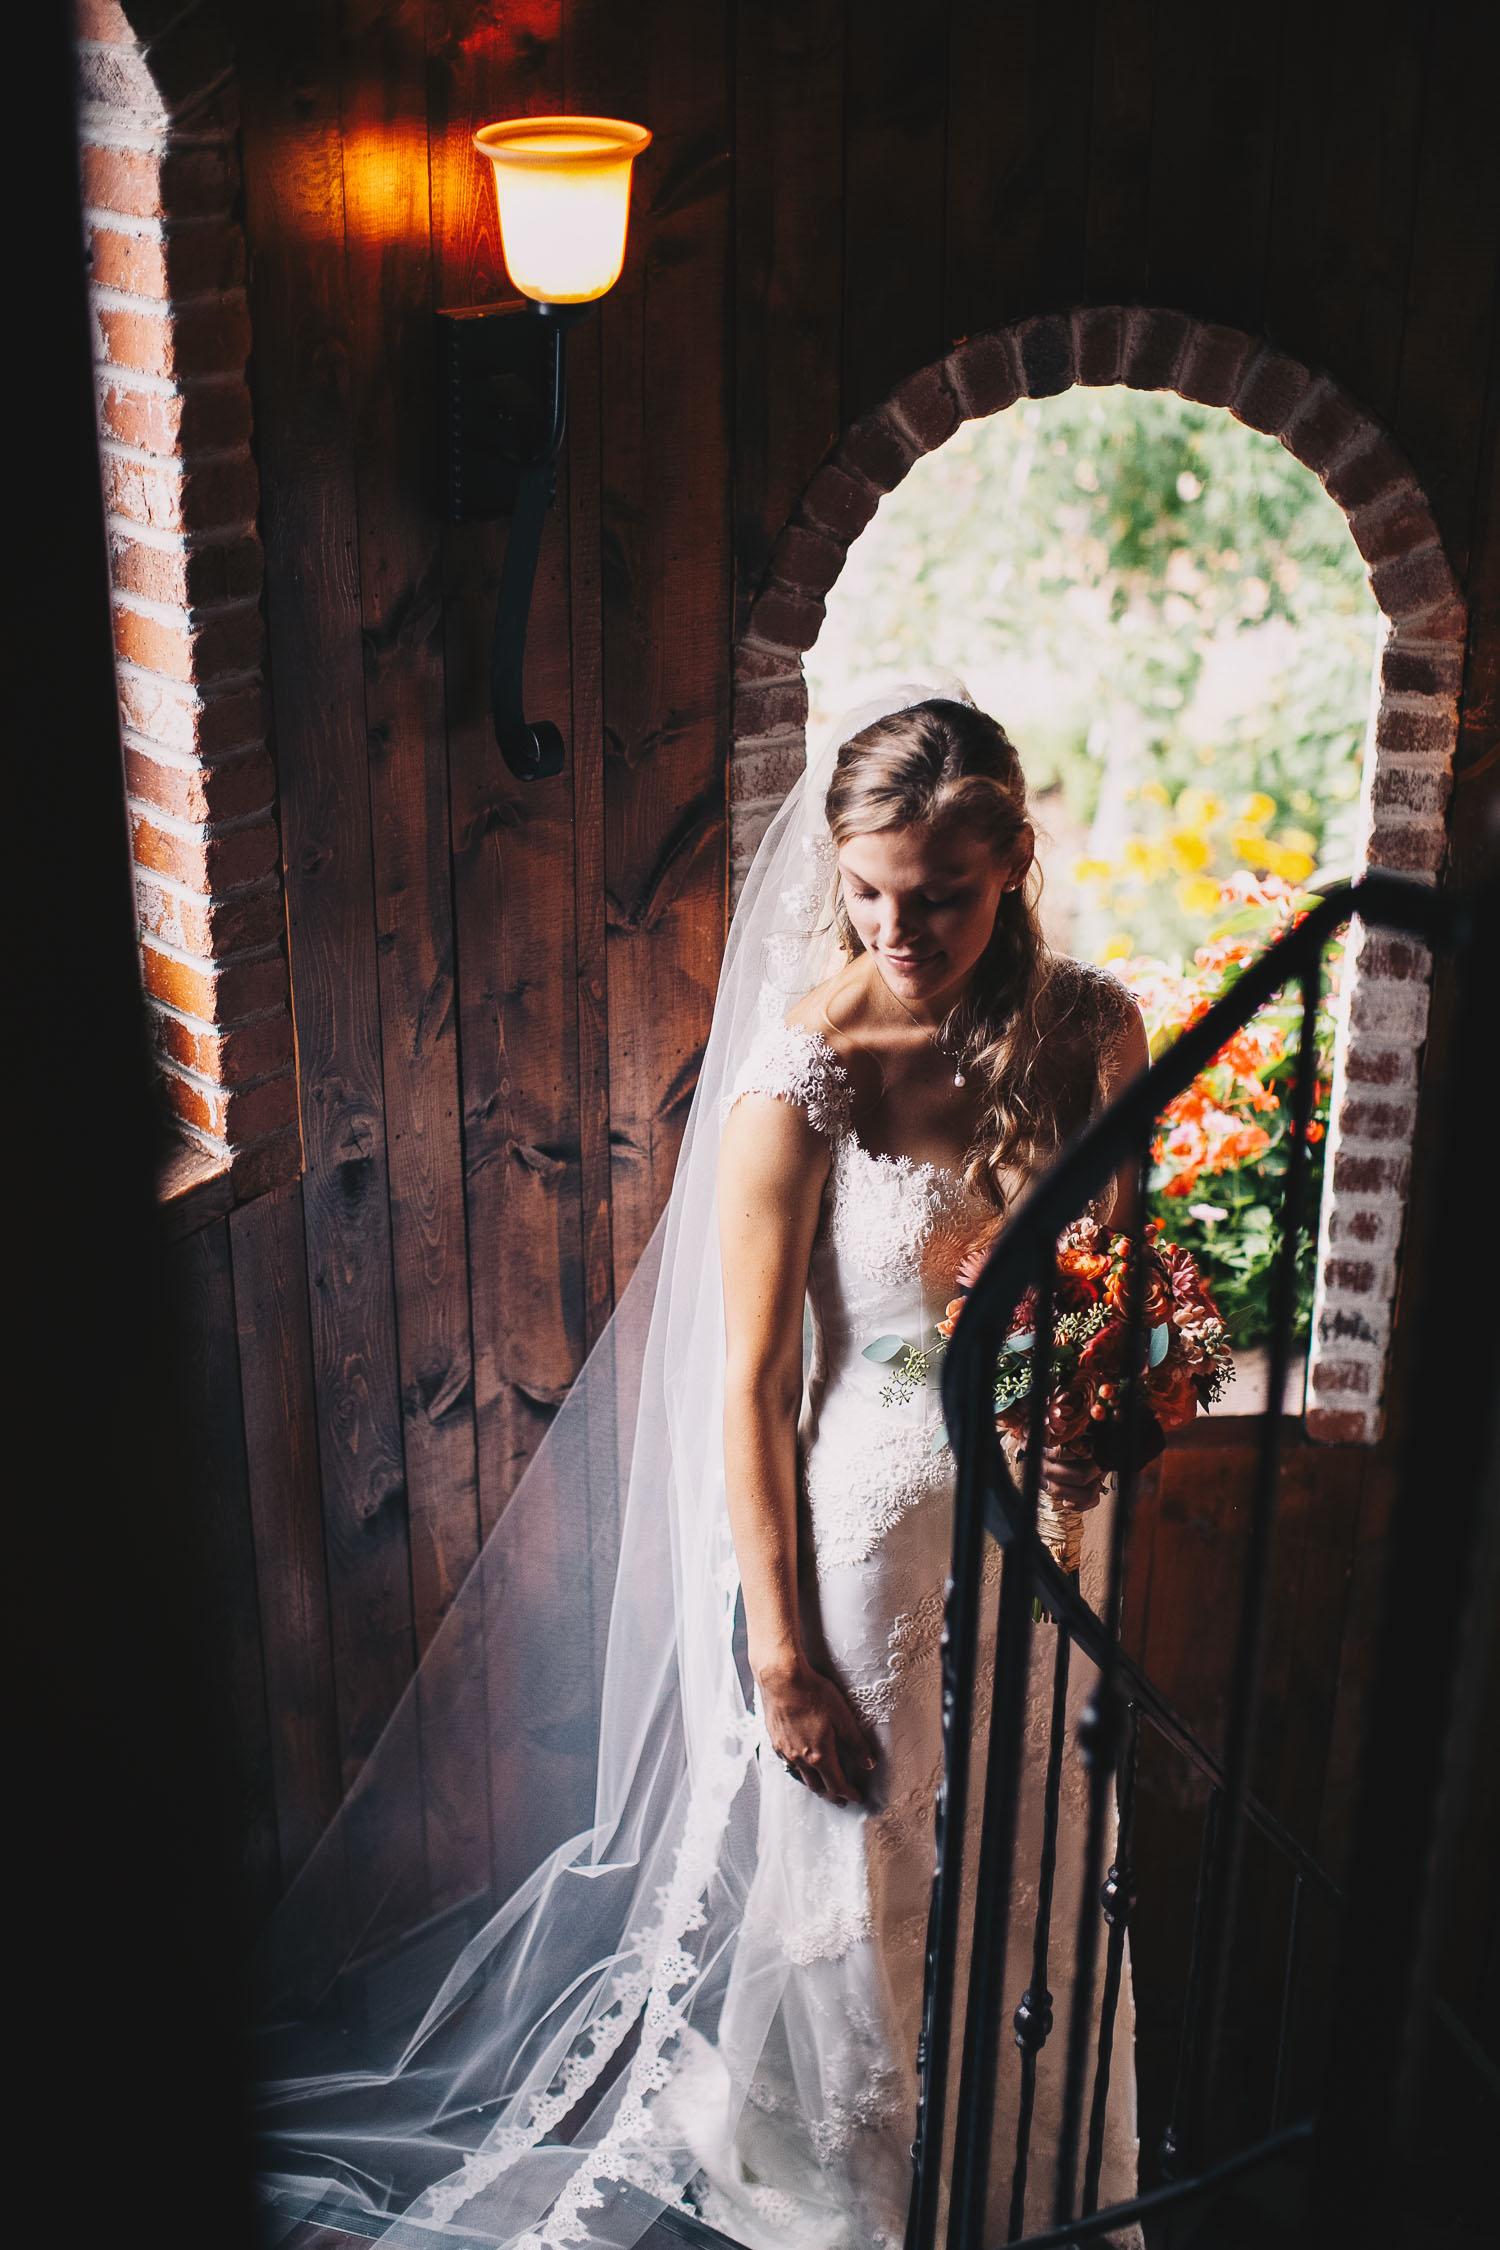 JMPHOTOART-Wedding-Photographer-166.jpg